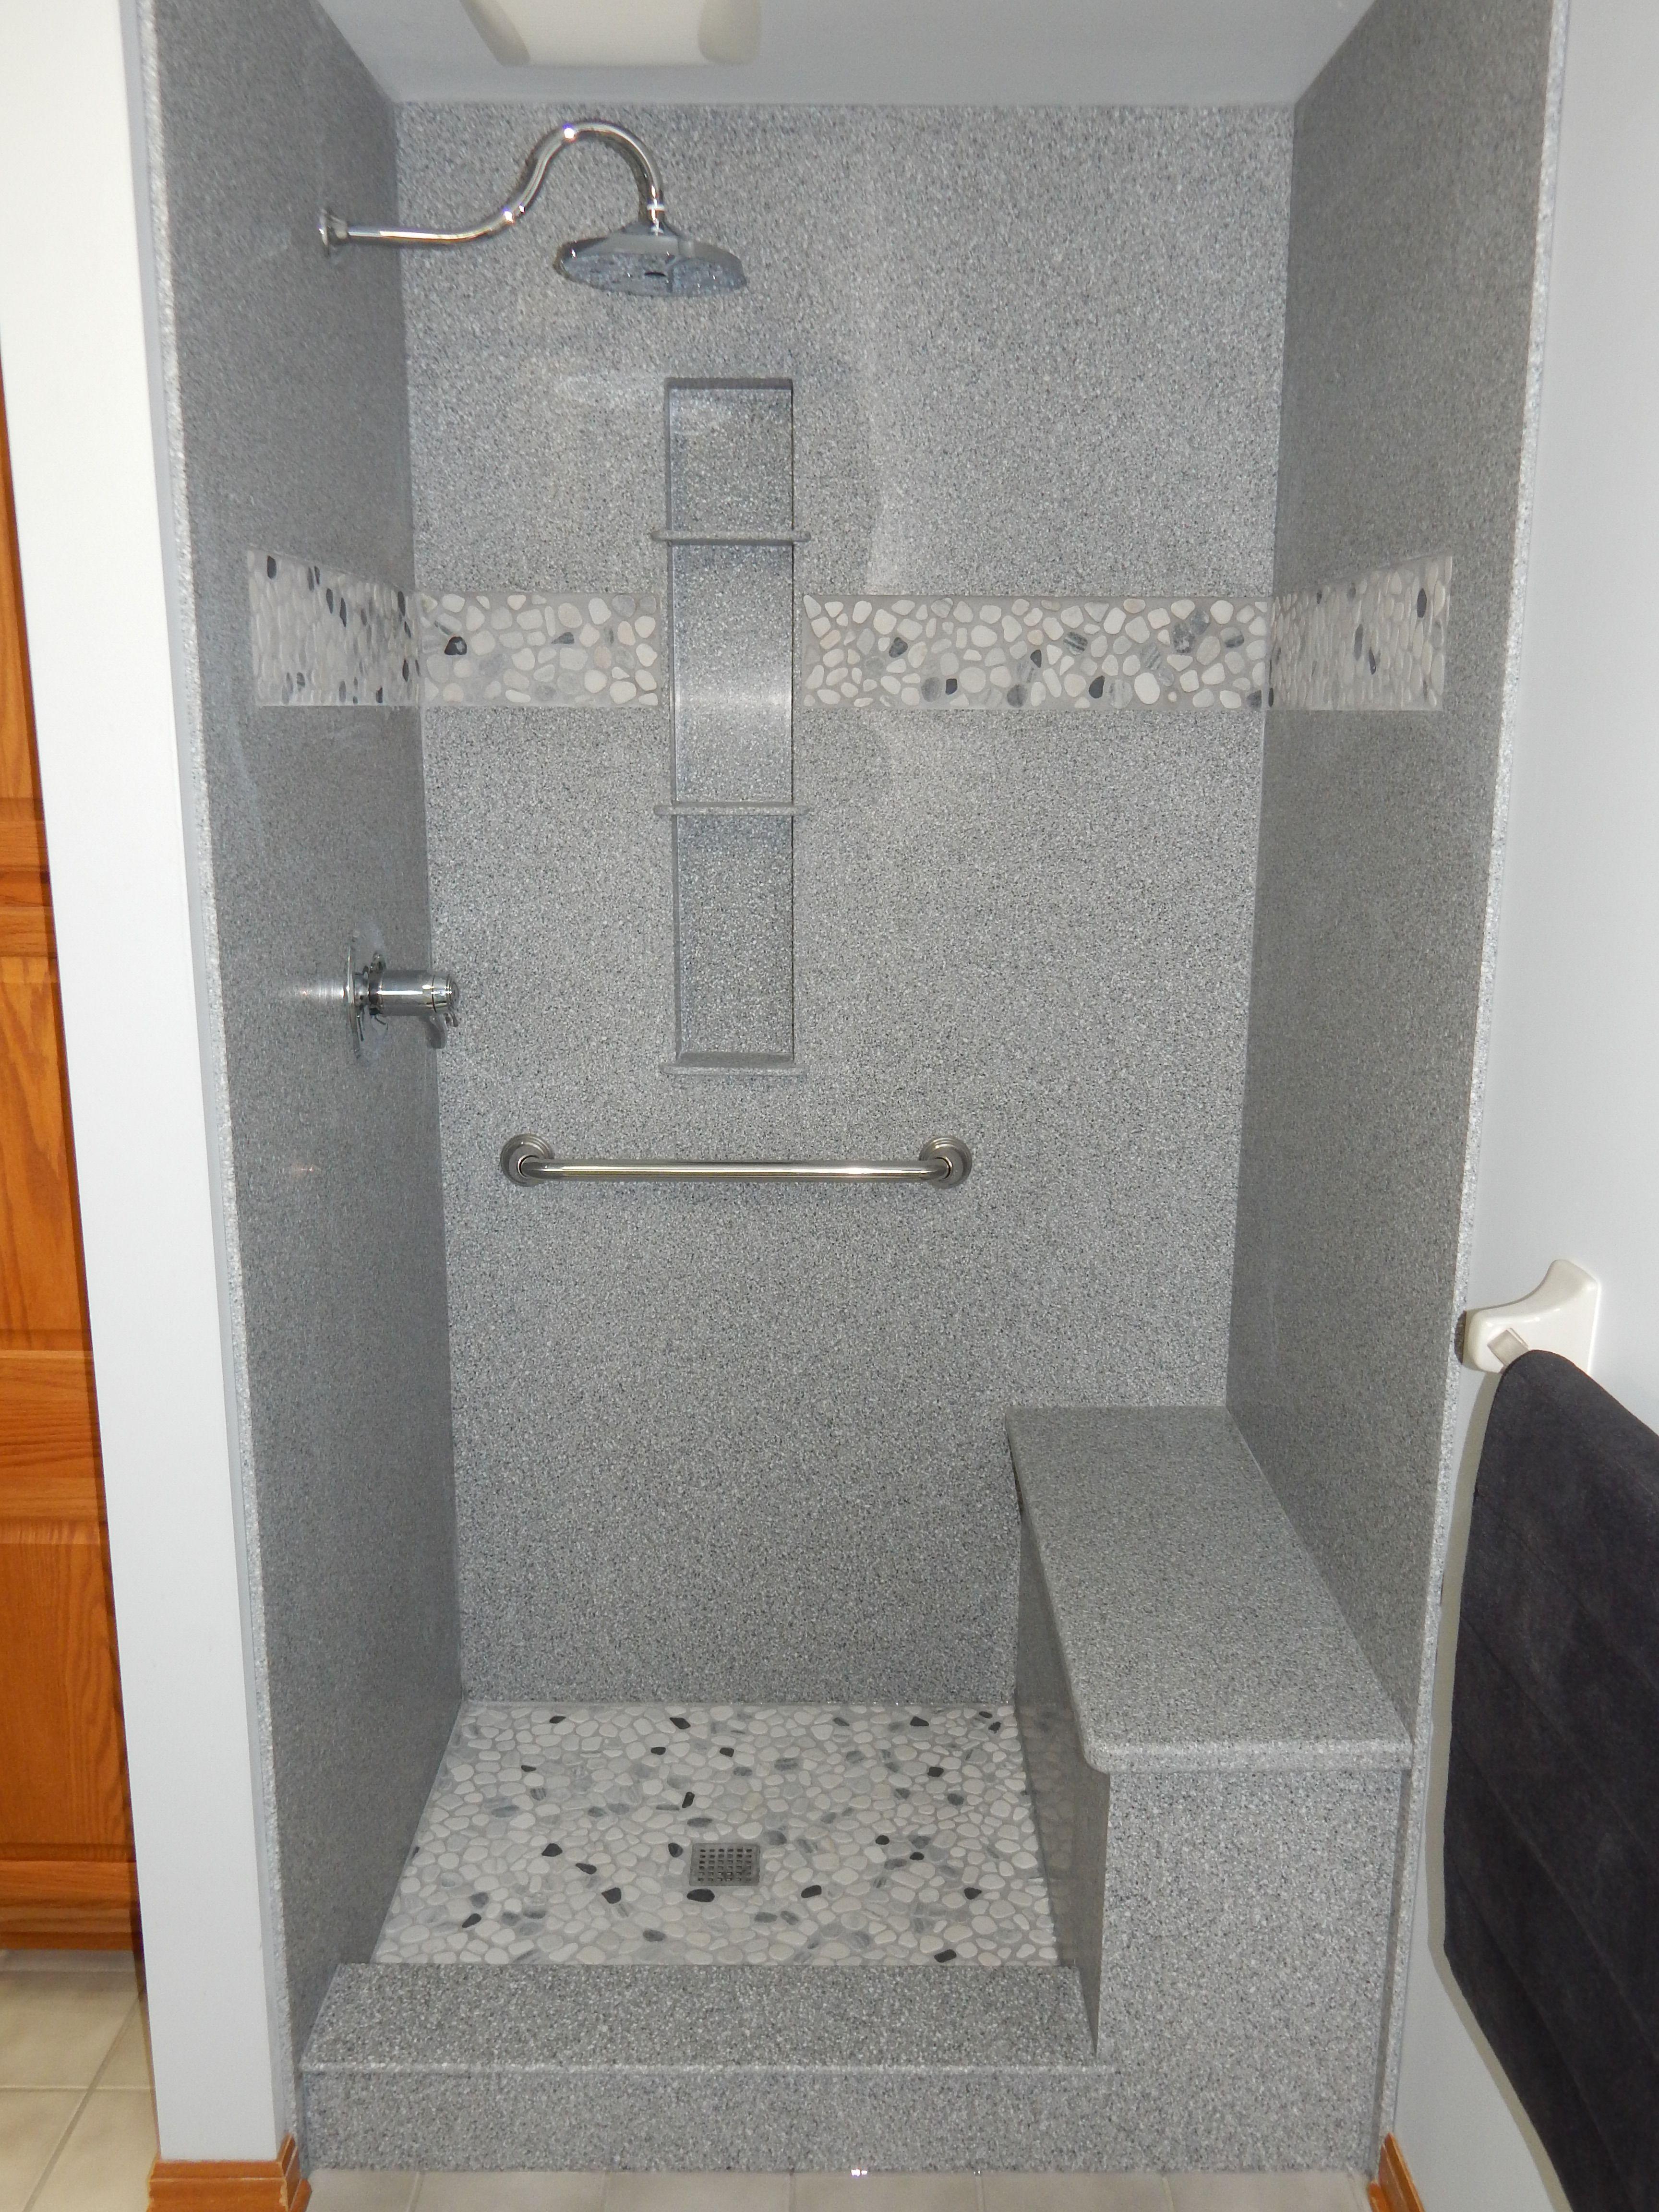 Custom Corian Shower With Pebble Floor And Inset Is Shown Here Before We Installed The Show Corian Shower Walls Waterproof Bathroom Wall Panels Diy Shower Door